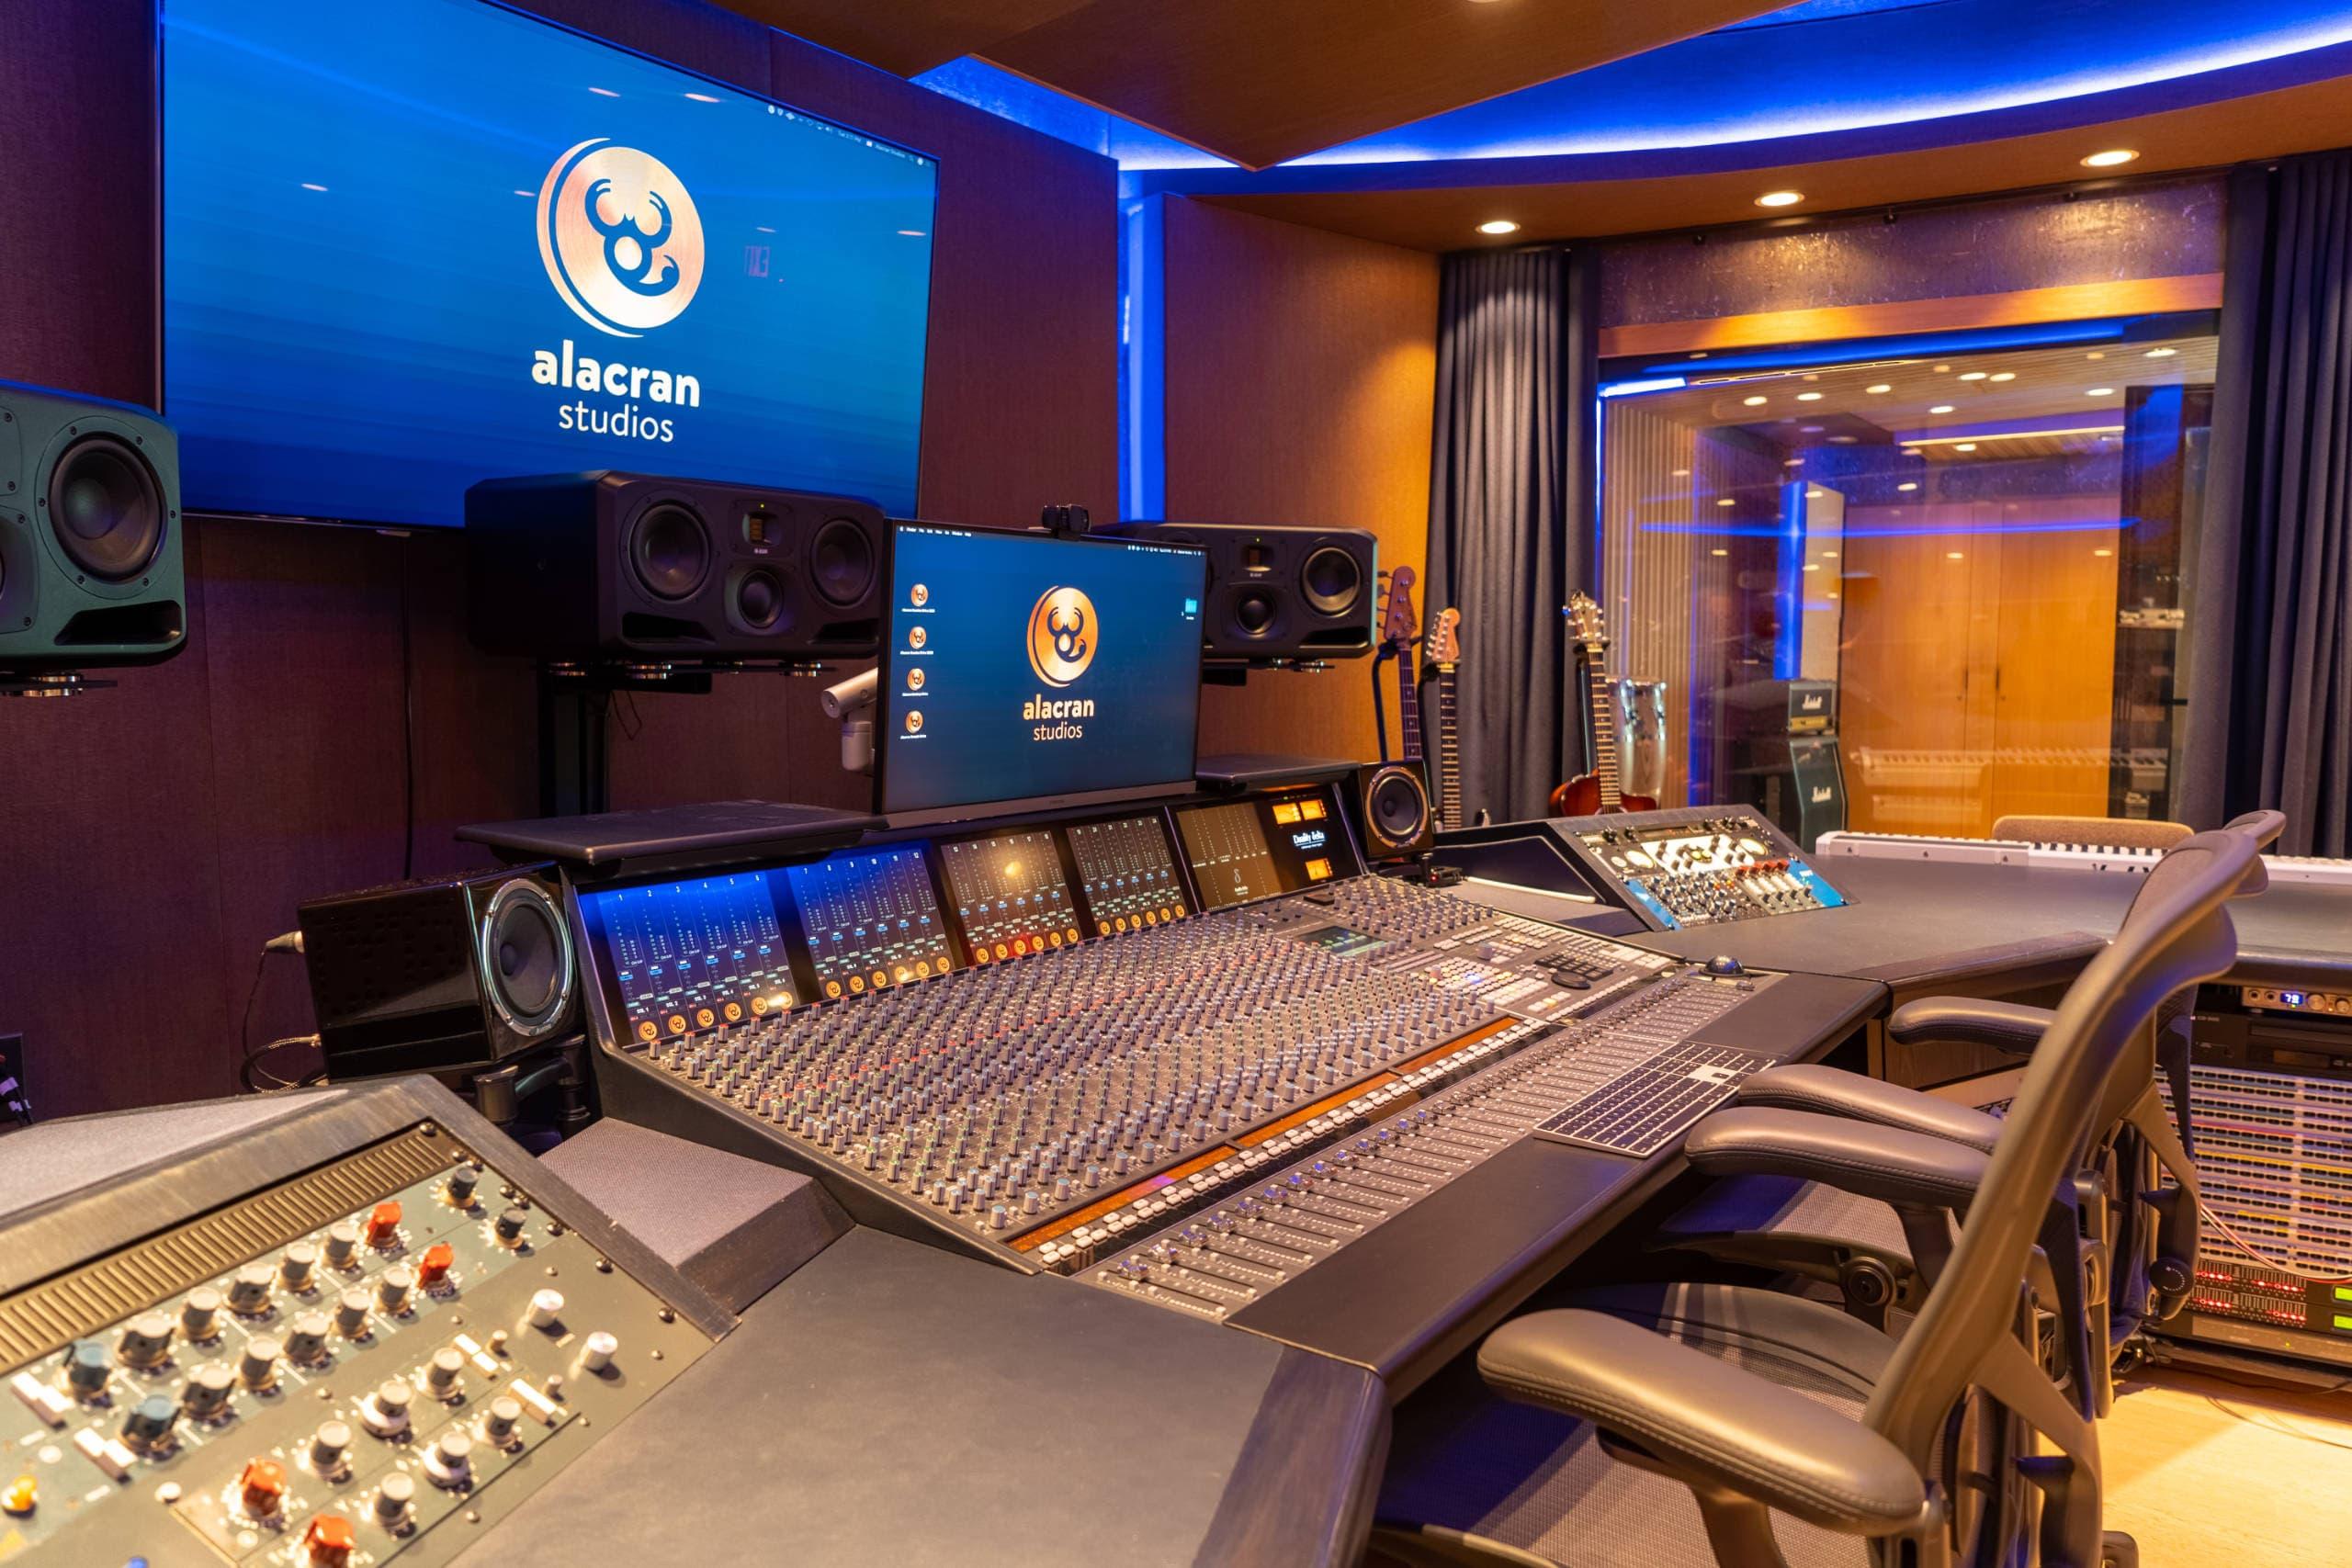 alacran-studio-01